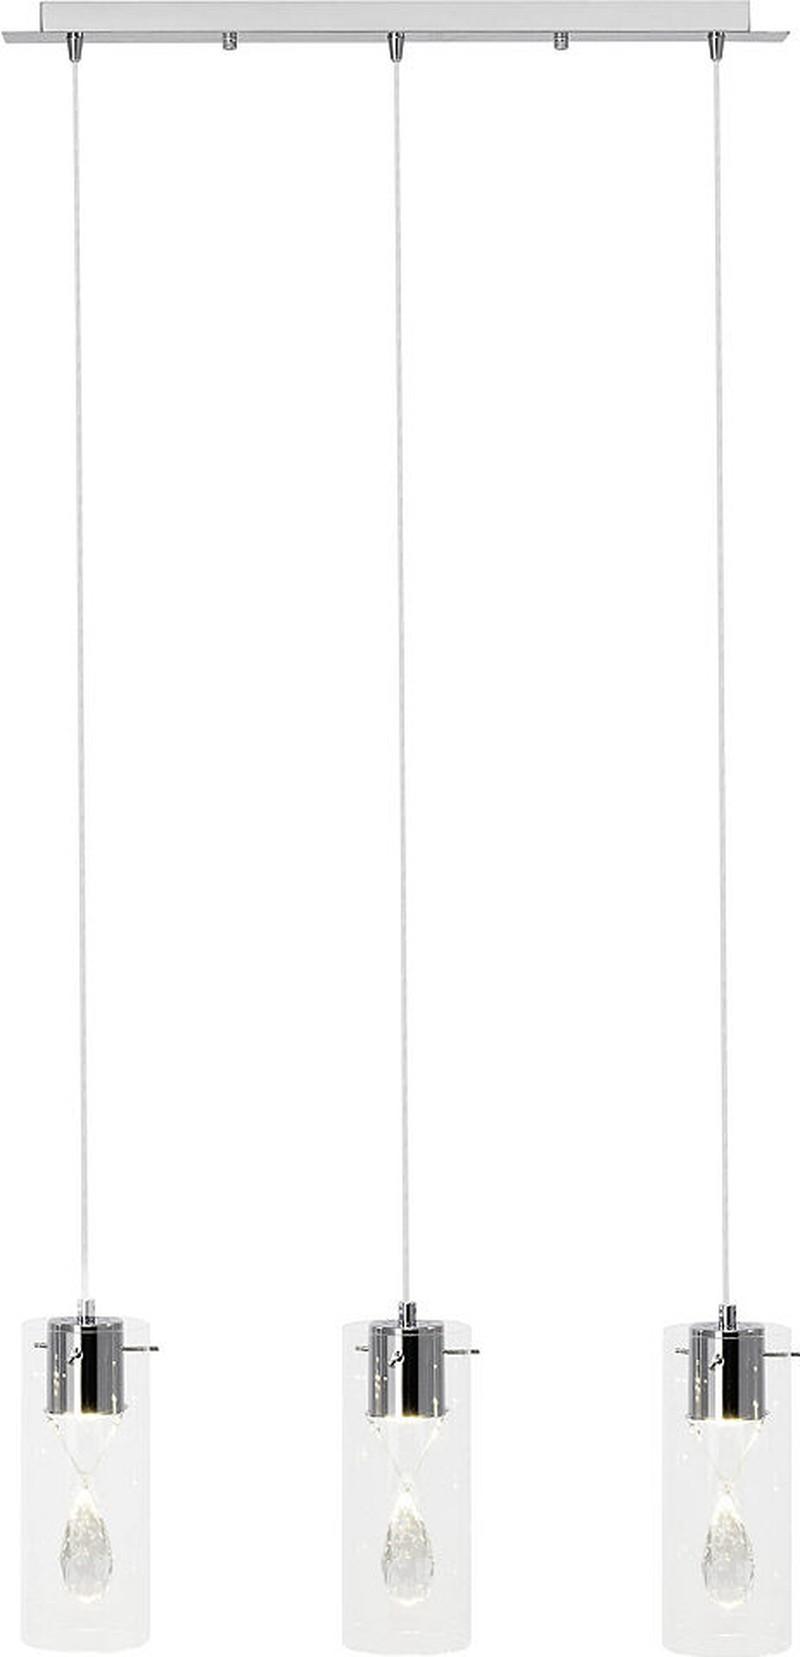 Brilliant Leuchten Razgar Pendelleuchte, 3-flammig chrom/transparent -